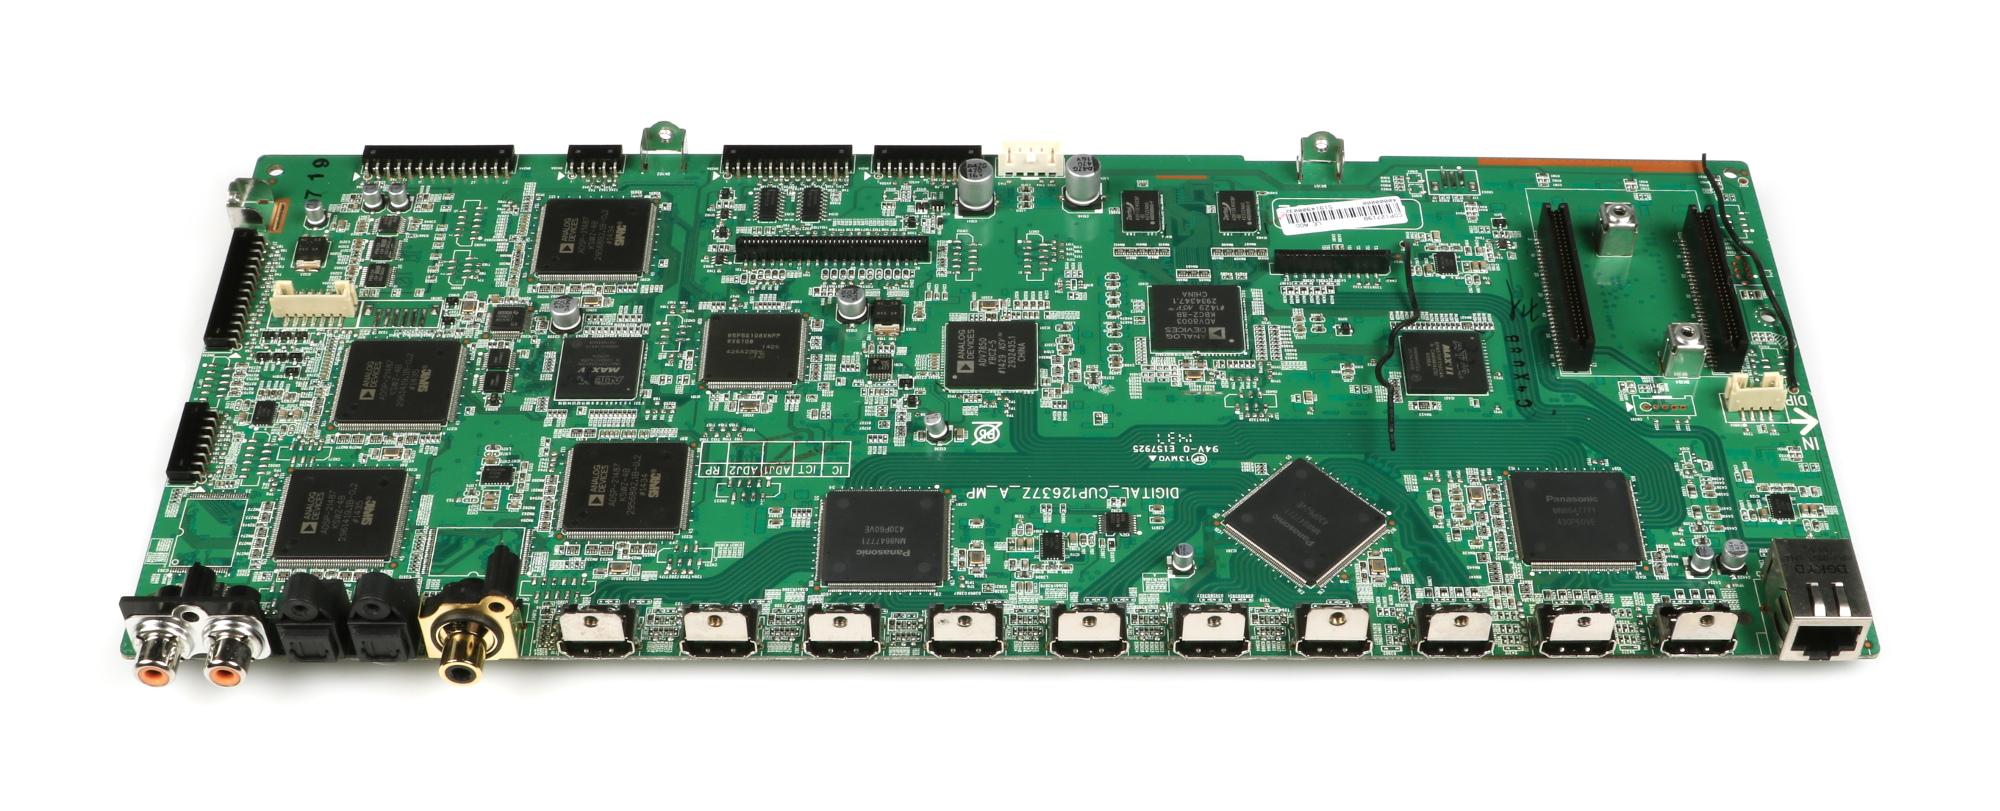 AVR-X4100W Digital PCB